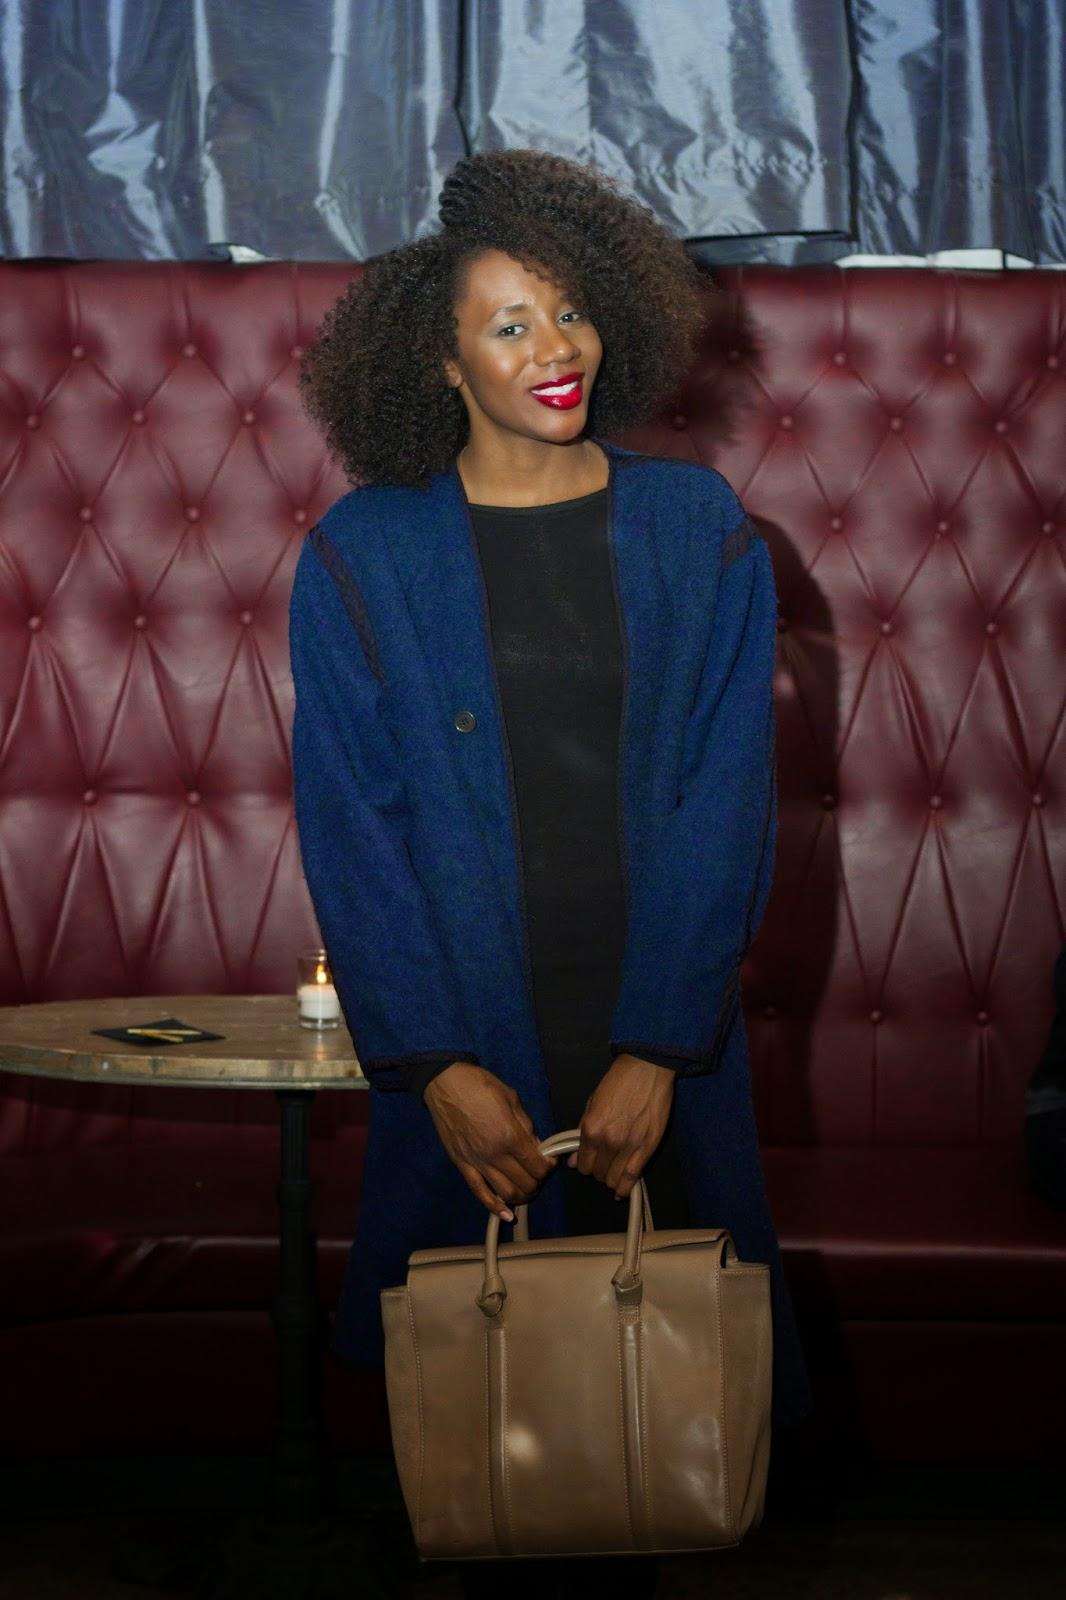 Raven Roberts. New York City Fashion Stylist.